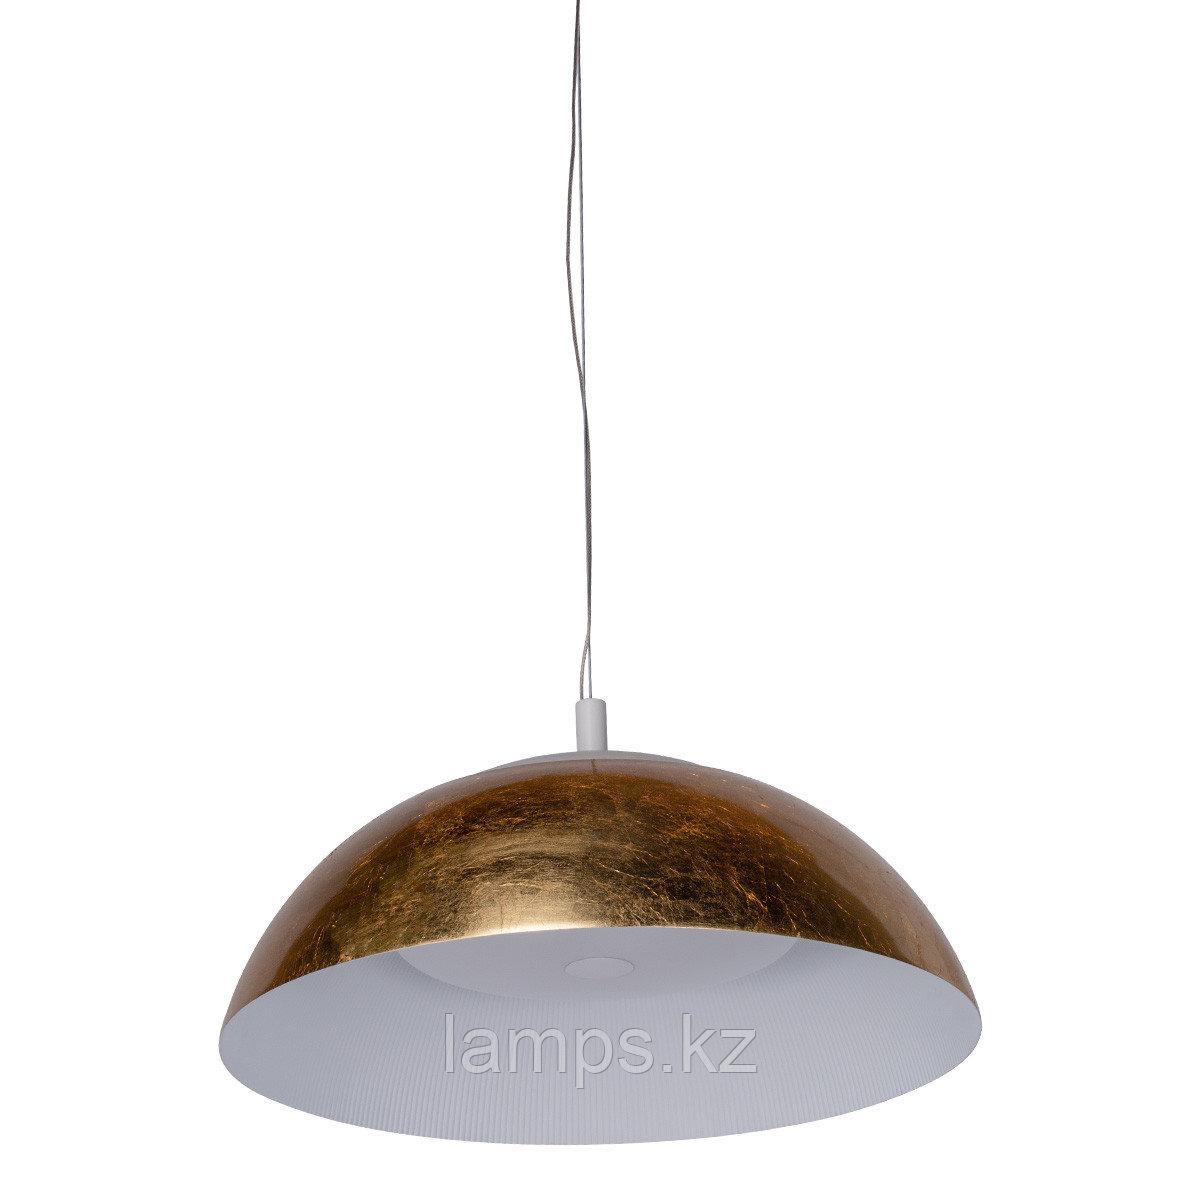 Люстра подвесная светодиодная LED MD 51417-1S